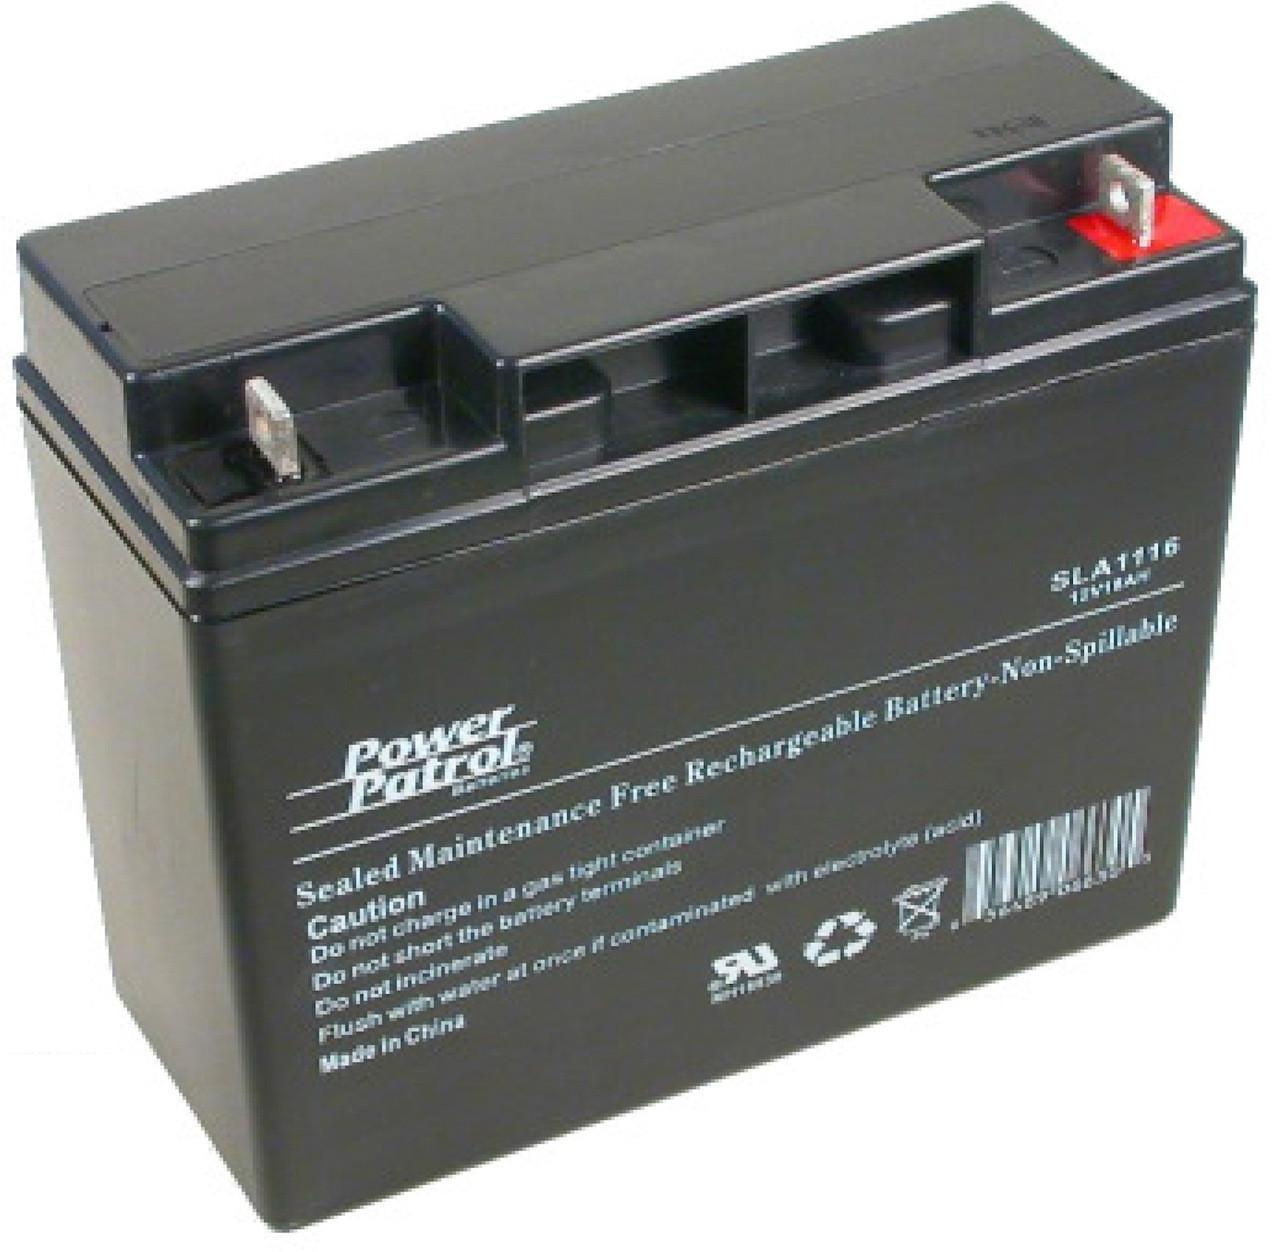 Interstate® Batteries Power Patrol® 12V 44Ah Maintenance-Free Rechargeable  Sealed Deep-Cycle VRLA/AGM Battery (SLA1161)